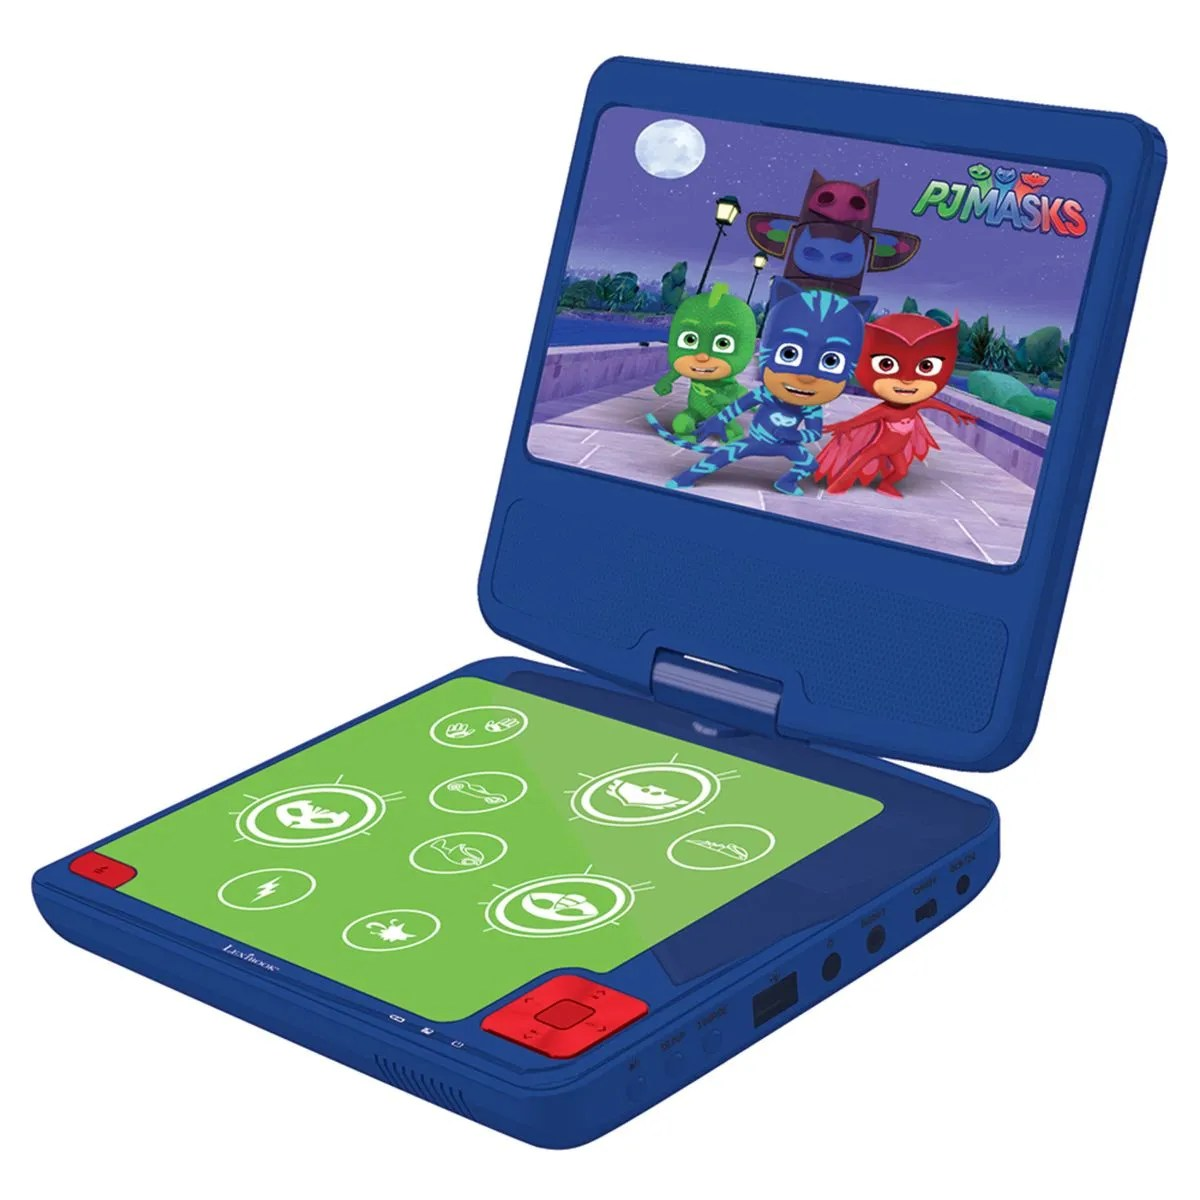 lexibook pj masks portable dvd player